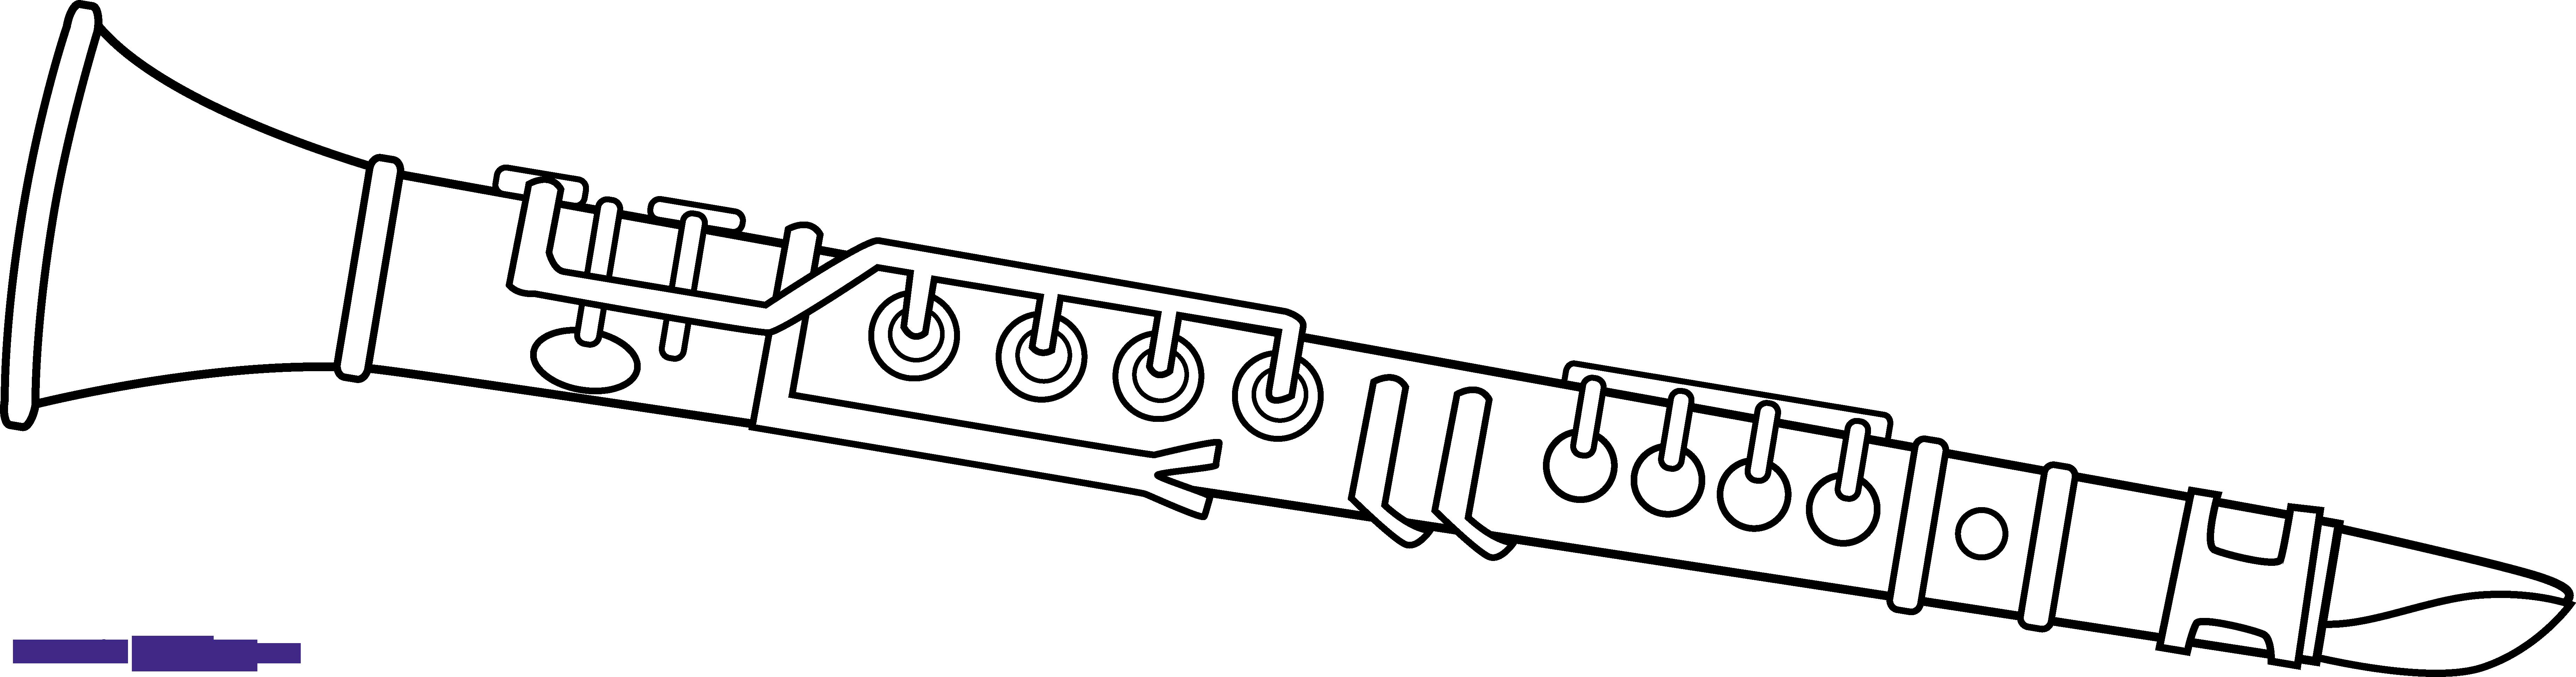 Clarinet Line Art Clipart.